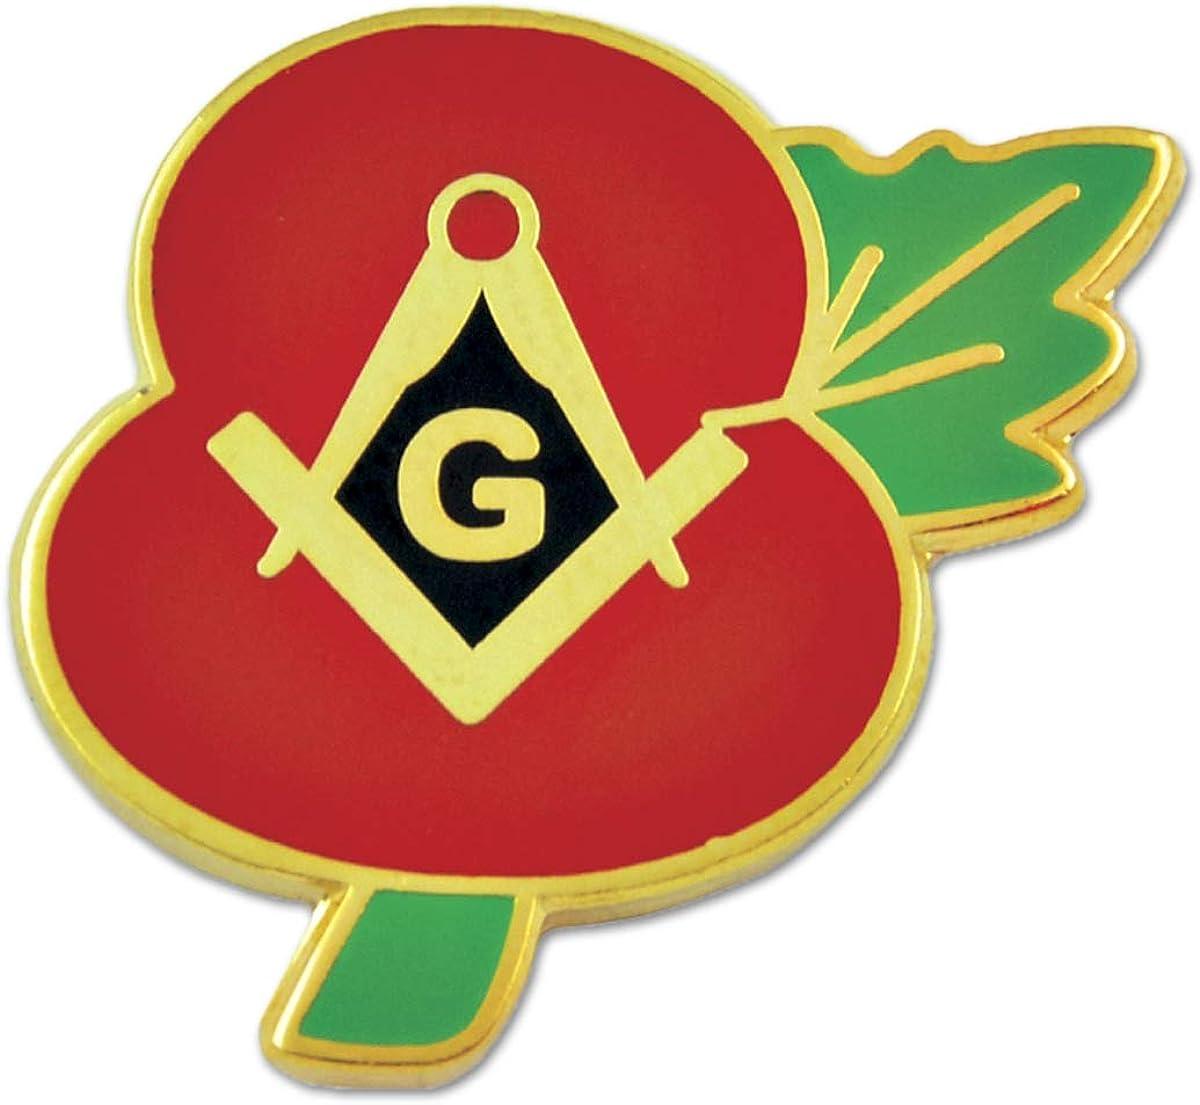 10 Years a Mason Masonic Commemorative Lapel Pin Badge *Exclusive*